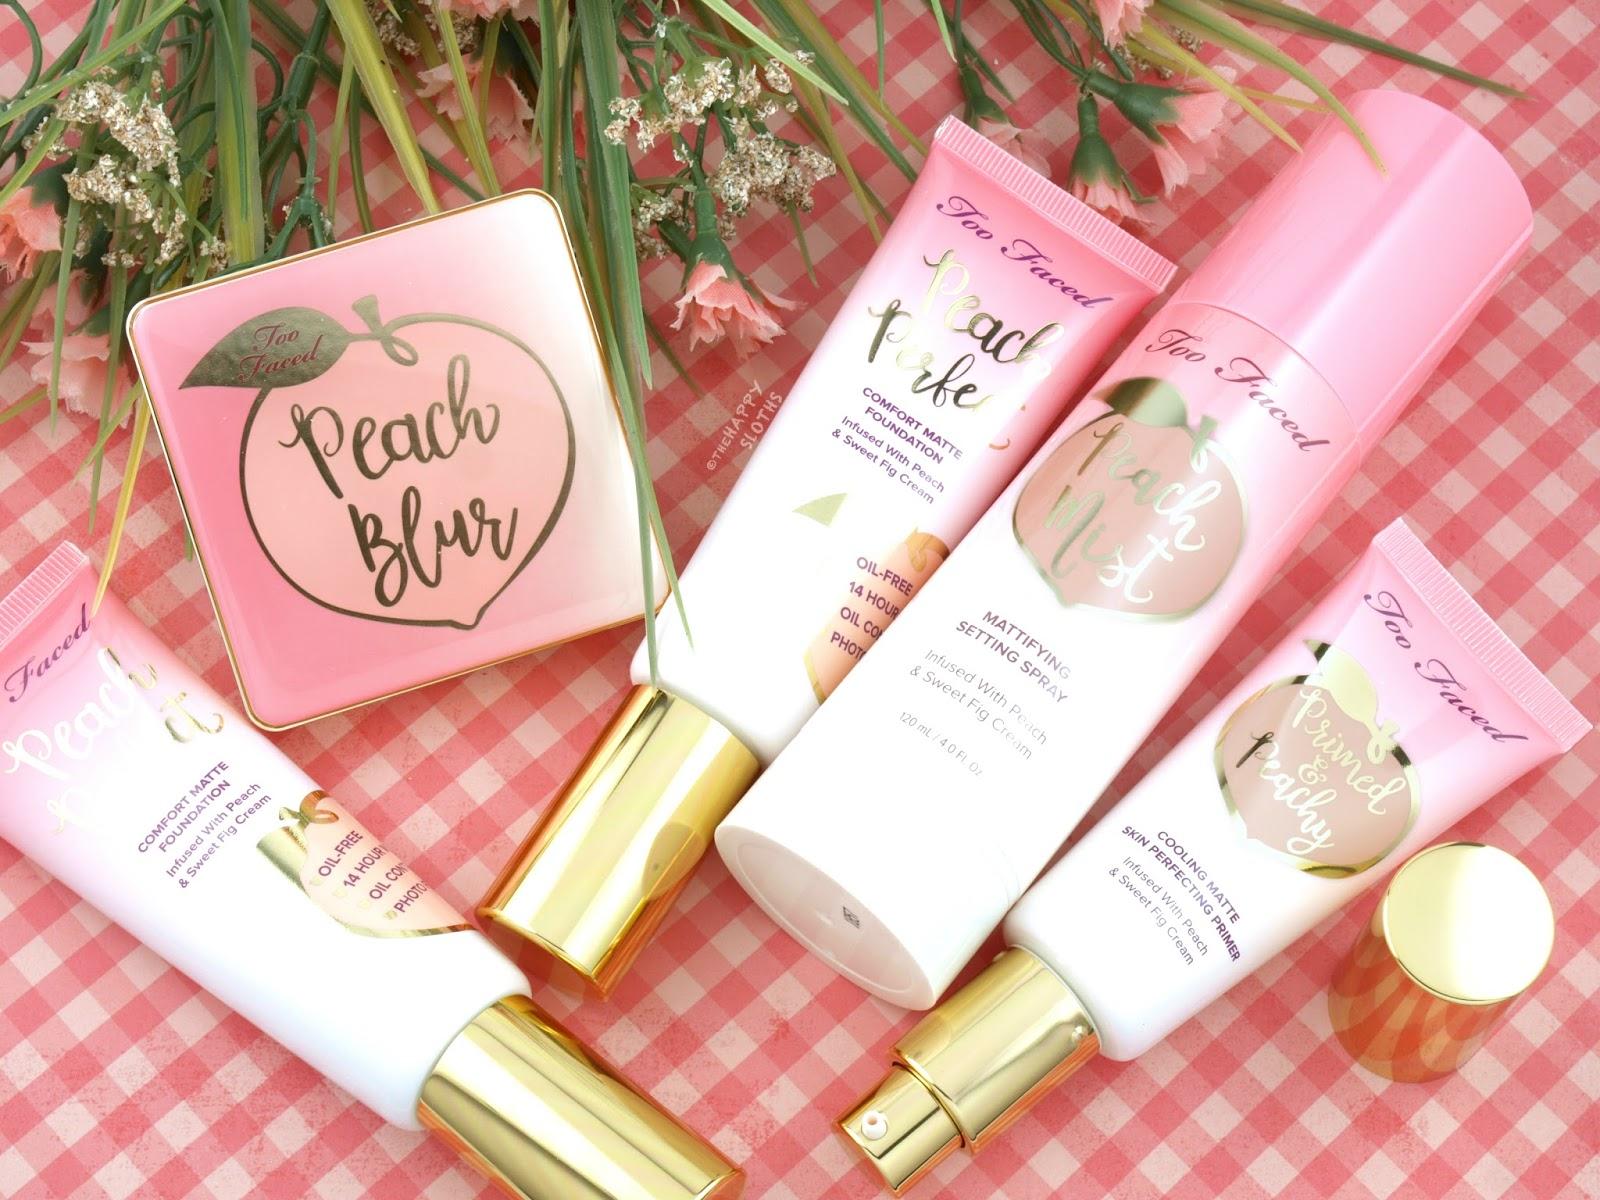 Too Faced Peaches & Cream Collection   Peach Blur Powder, Peach Perfect Foundation, Primed & Peachy Primer & Peach Mist Spray: Review and Swatches